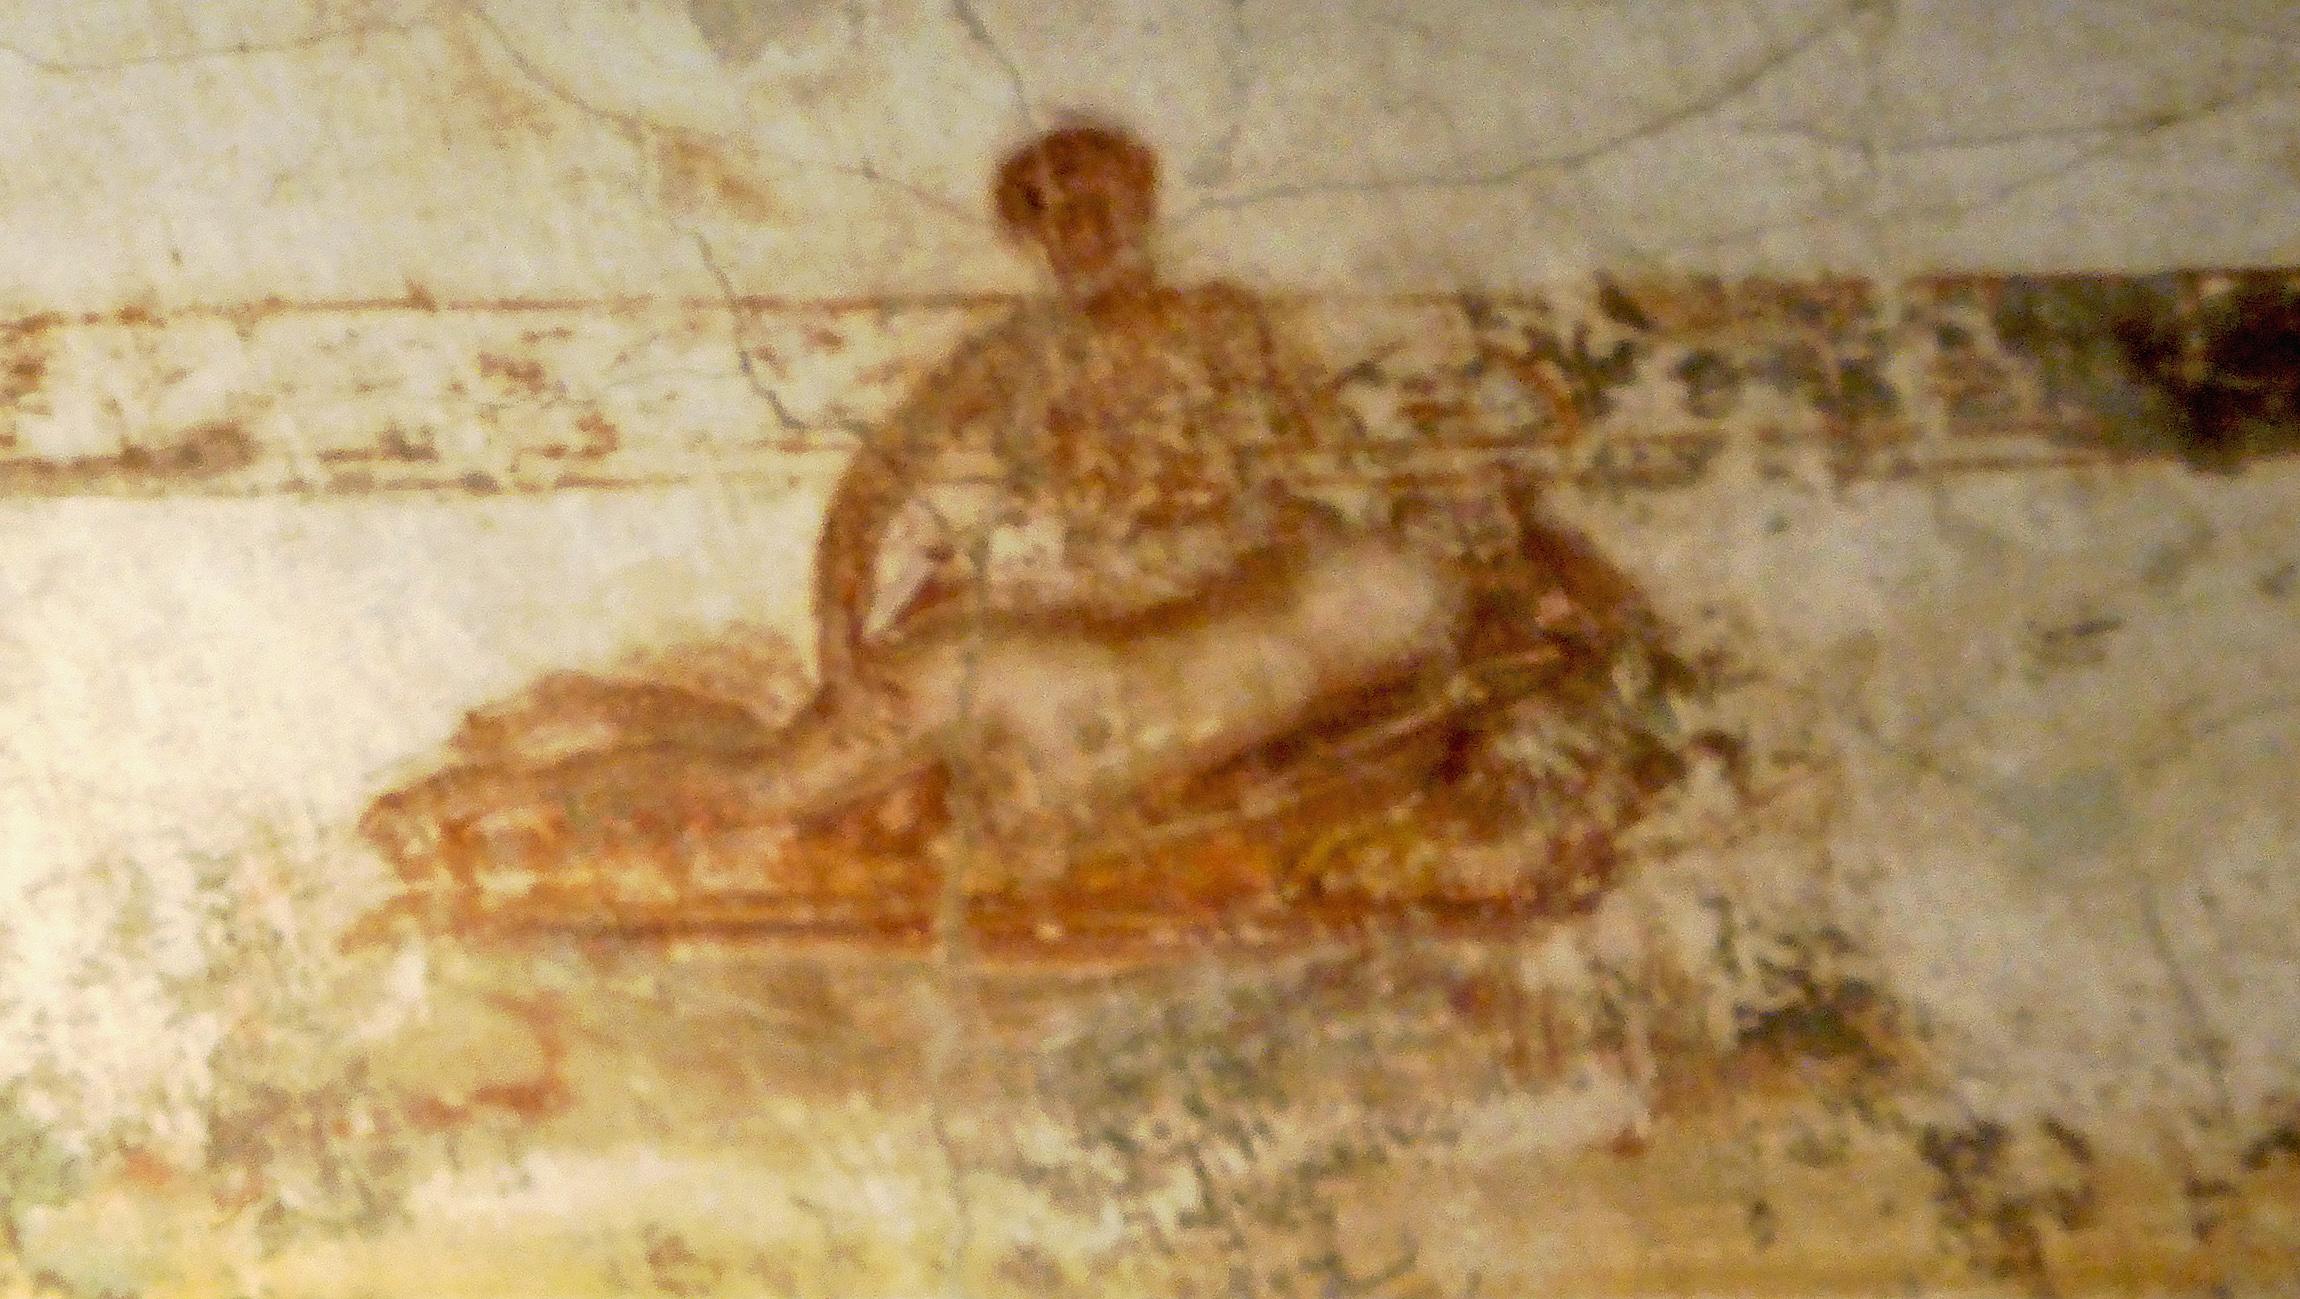 Suburban baths male-female couple P1050092